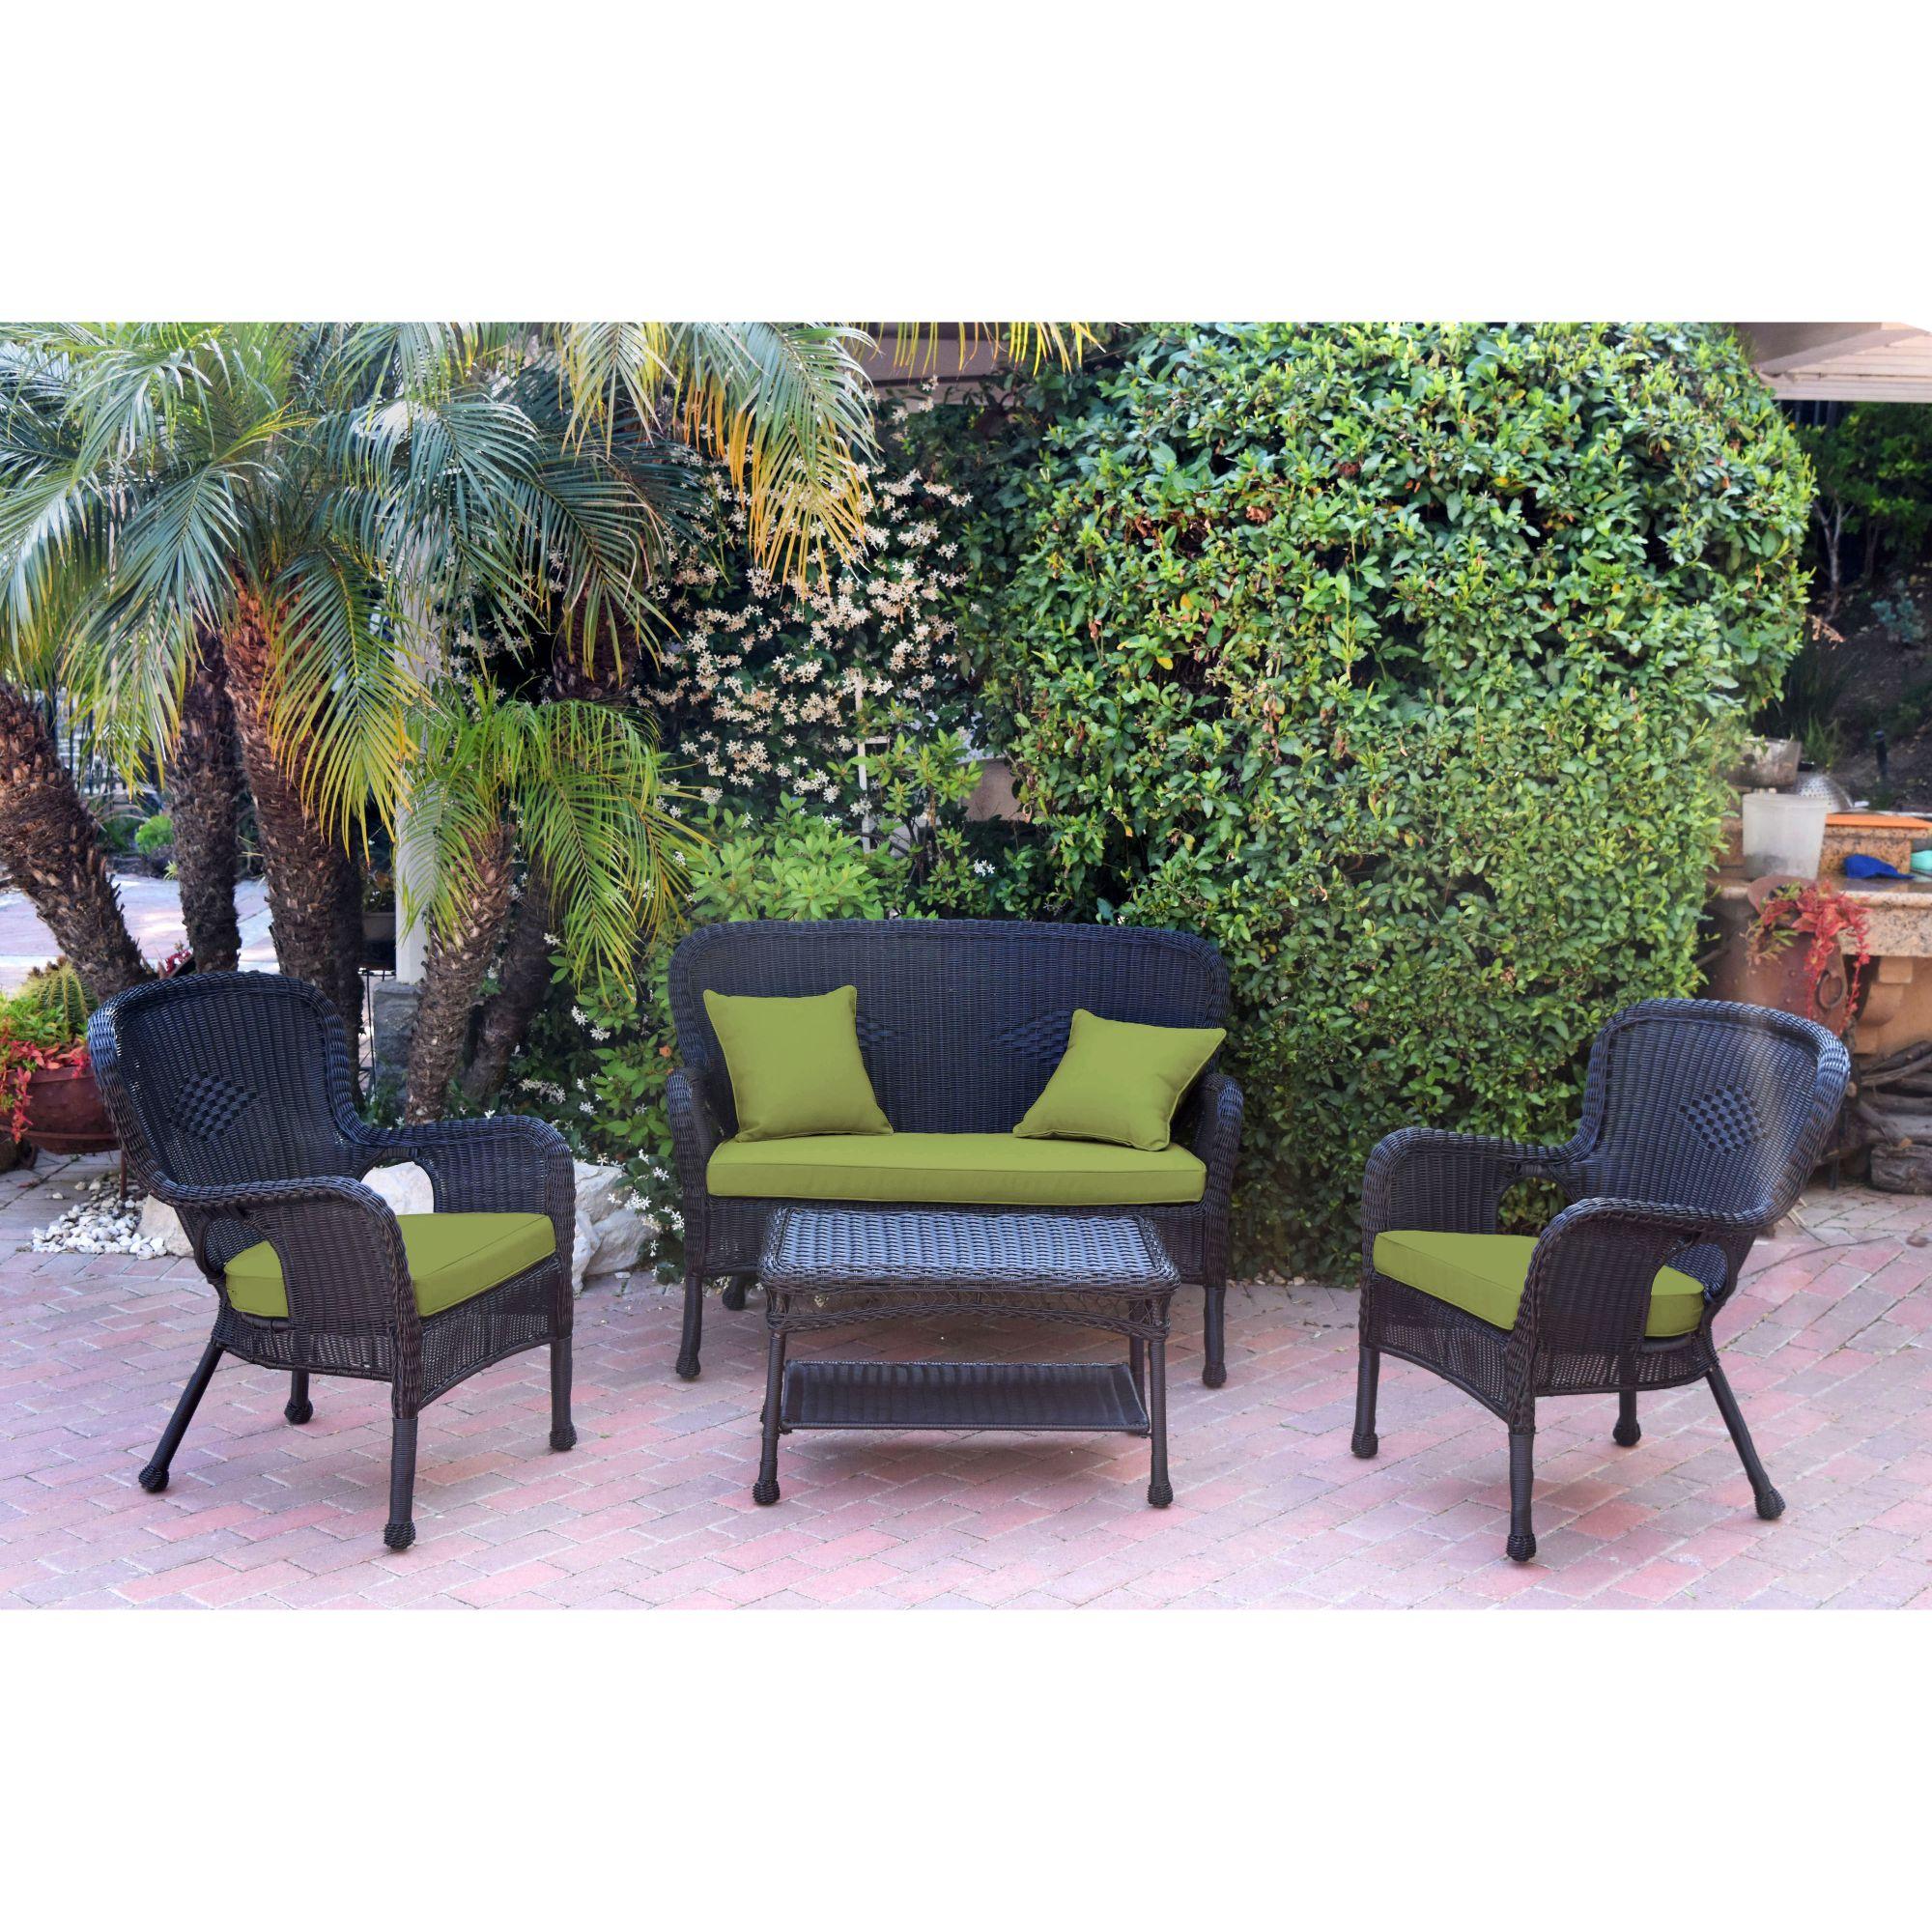 4 piece black solid wicker outdoor furniture patio conversation set sage green cushions walmart com